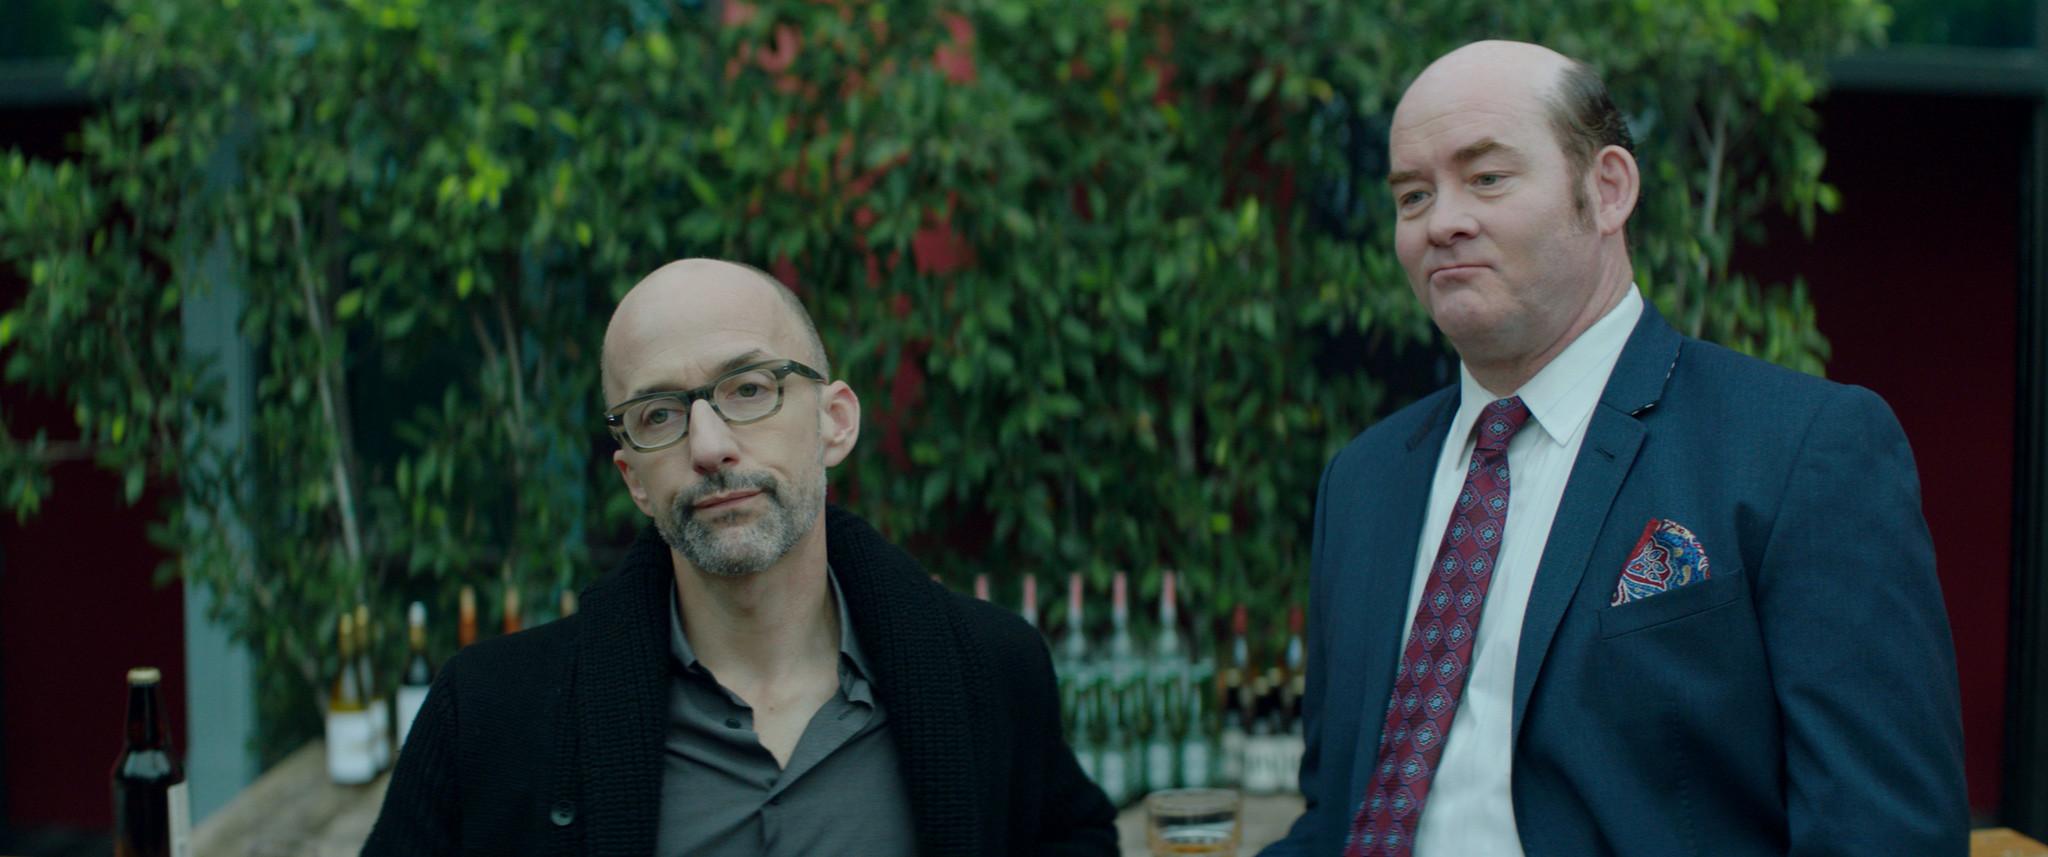 Jim Rash and David Koechner in Bernard & Huey.